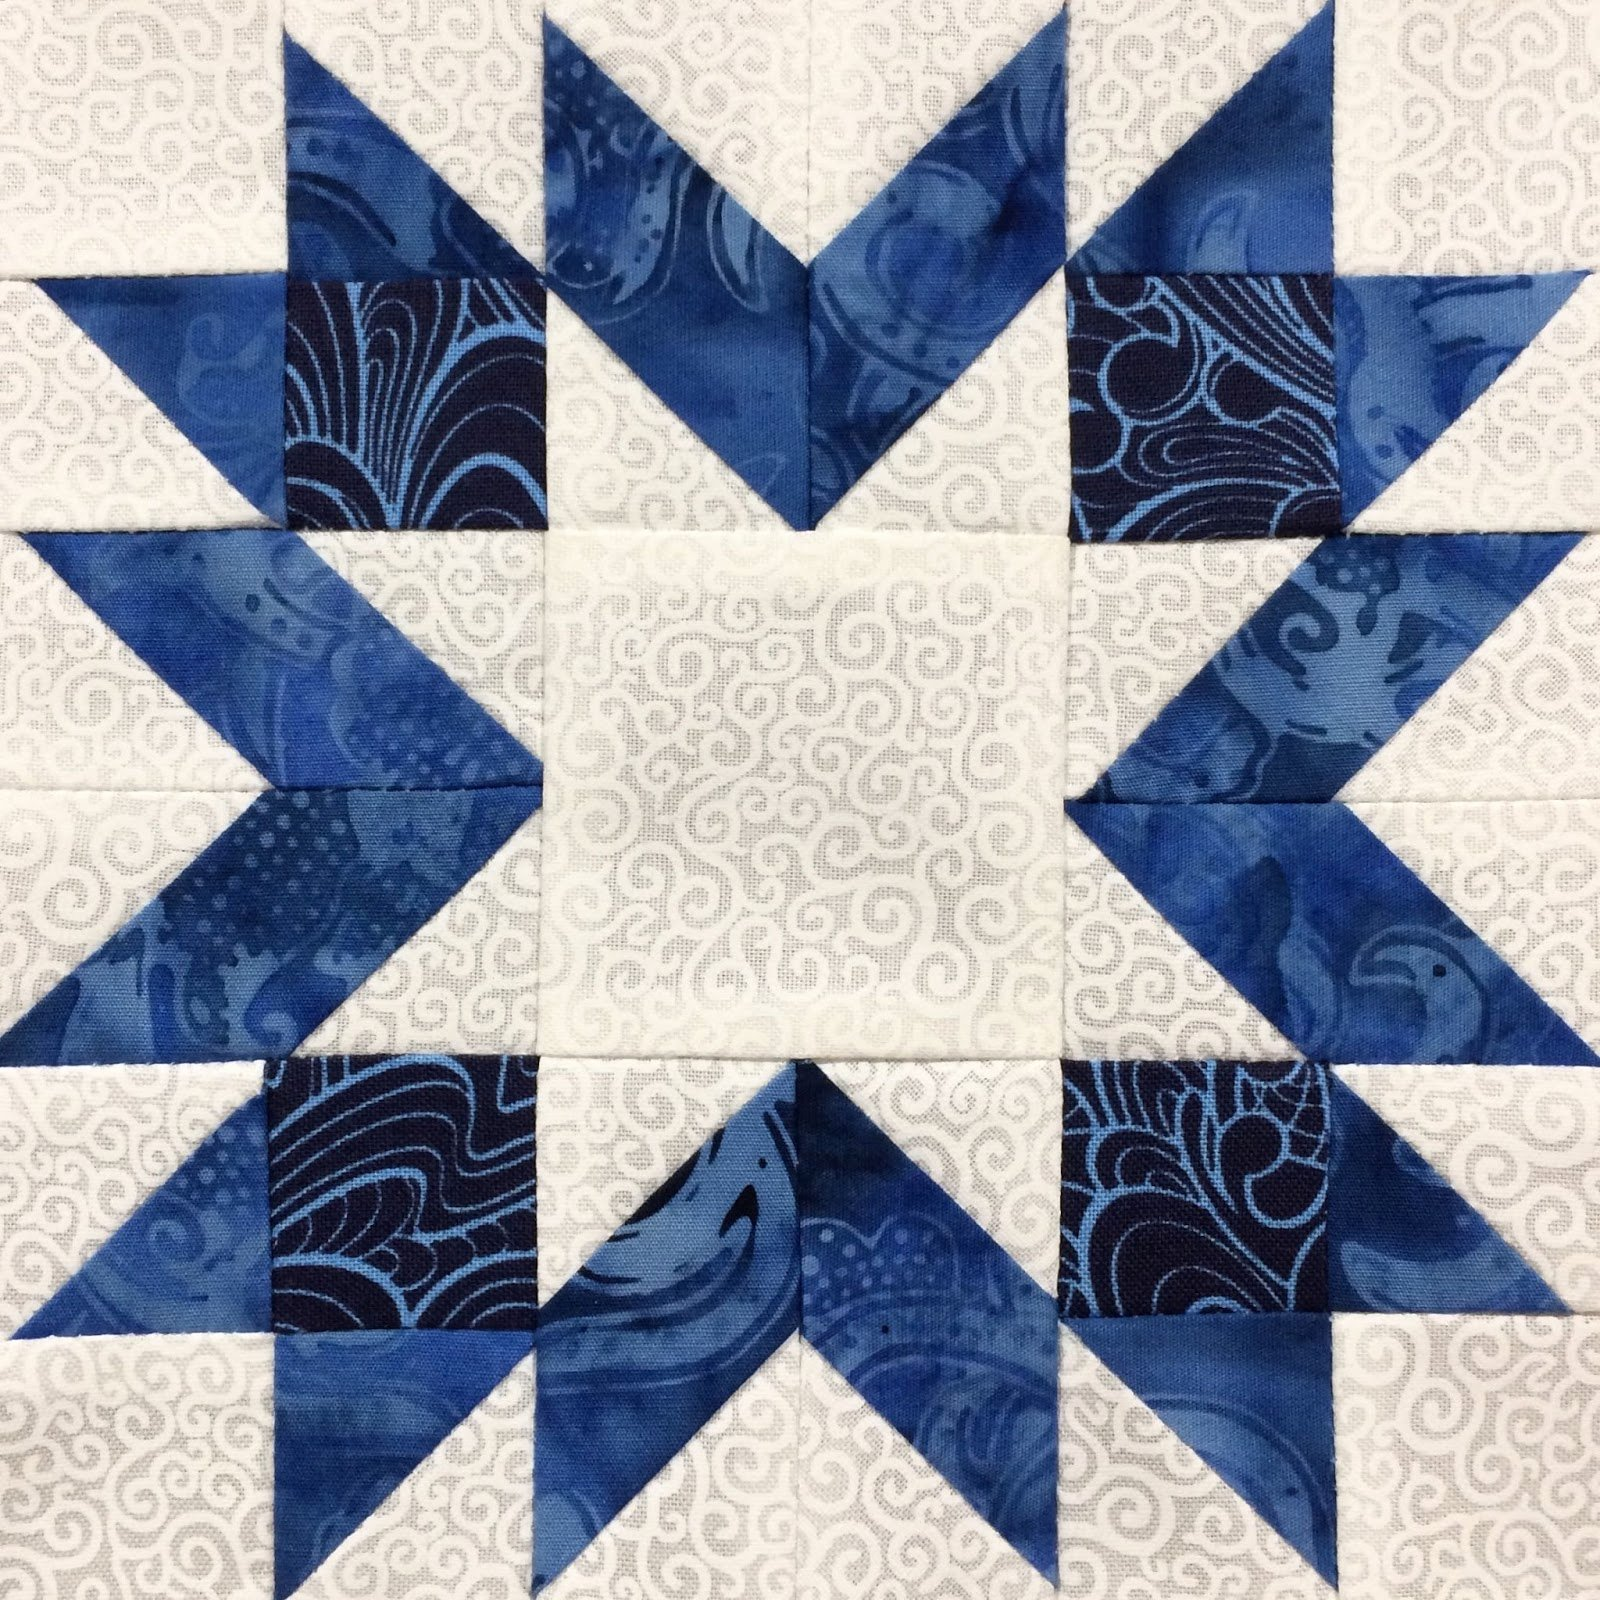 6 Inch Star Best Of Hand Made Karma Blue & White Sampler Six Inch Blocks